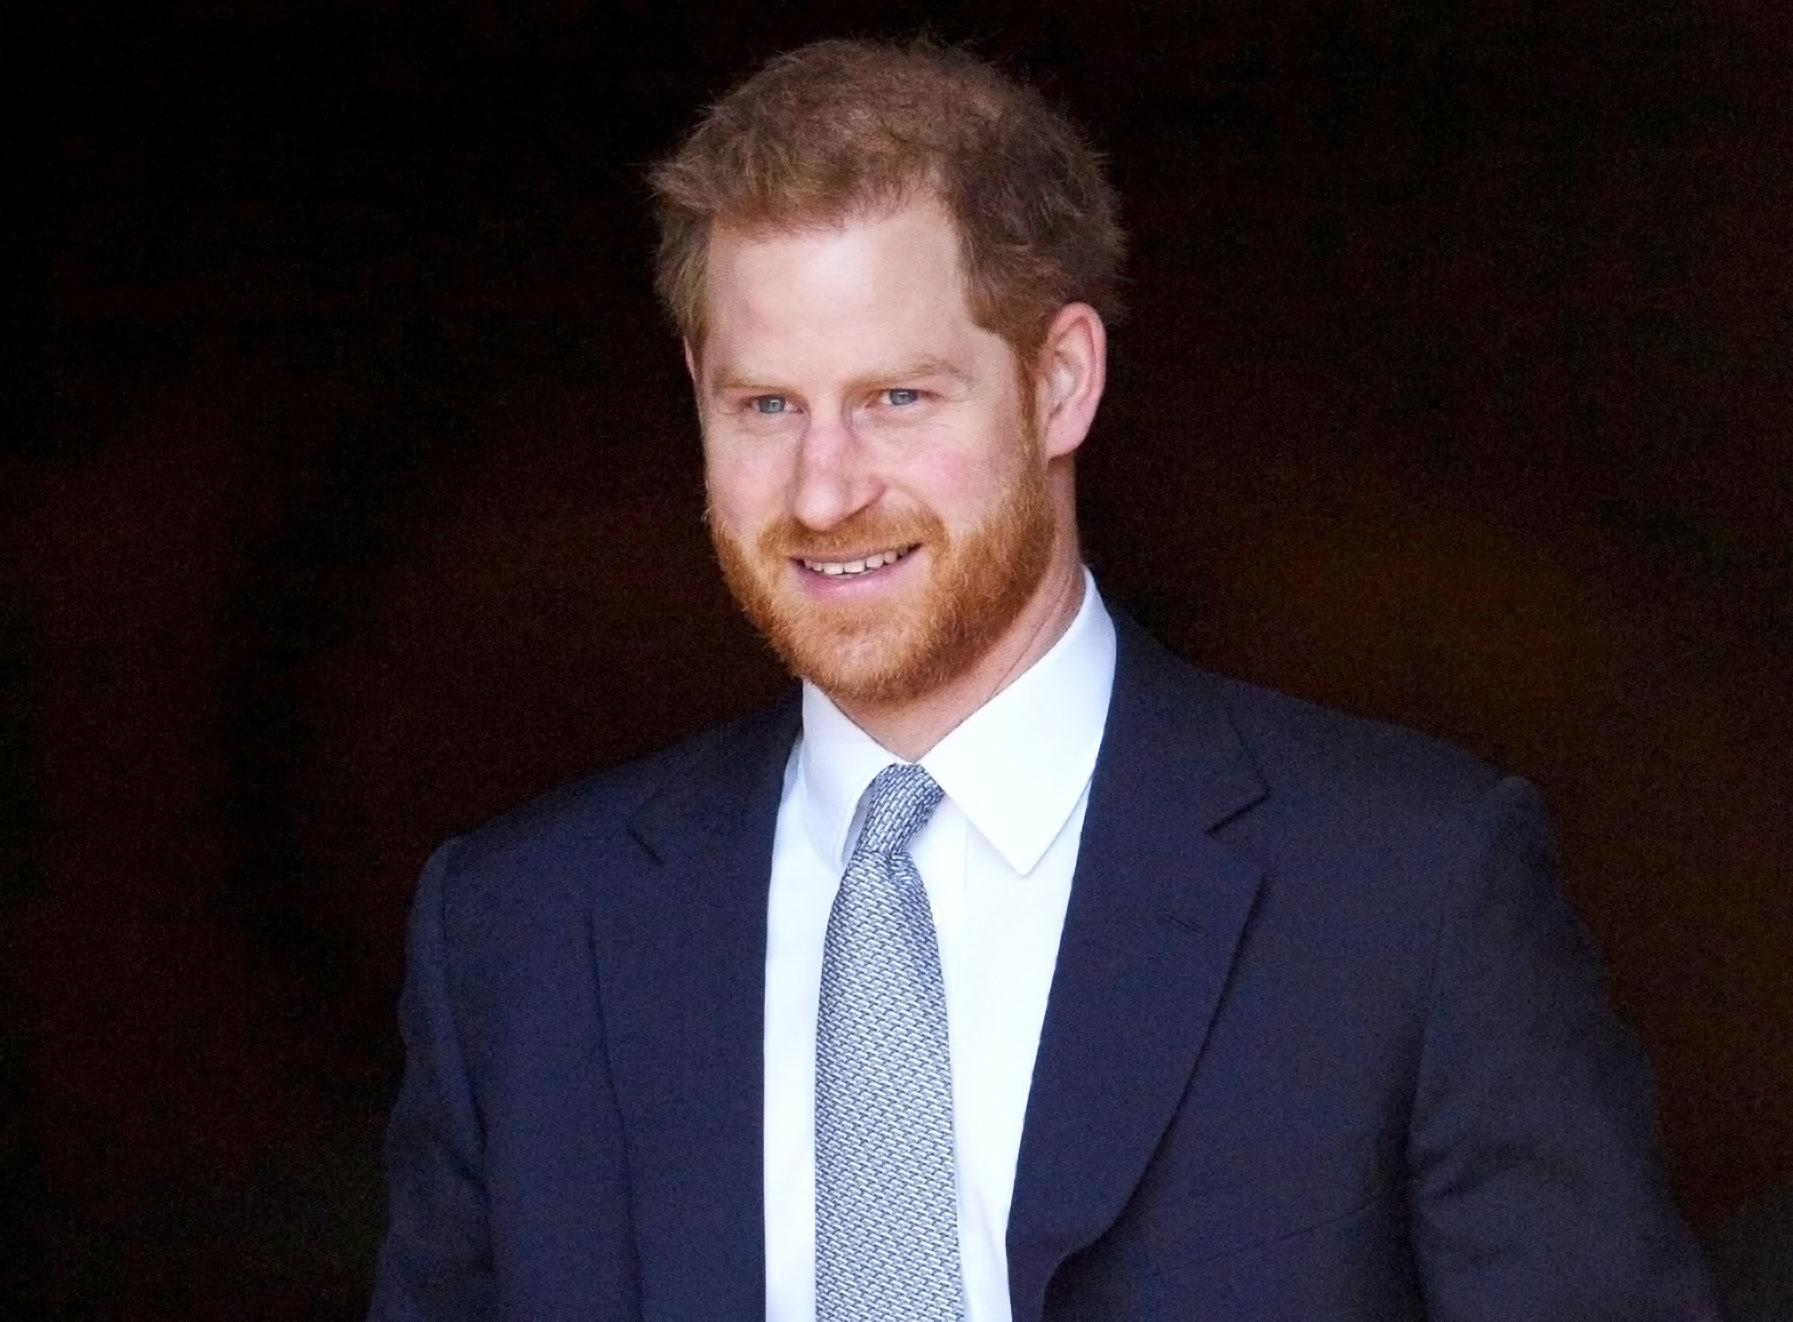 Prince Harry Returns UK Engagement After Royal Trademark Ban